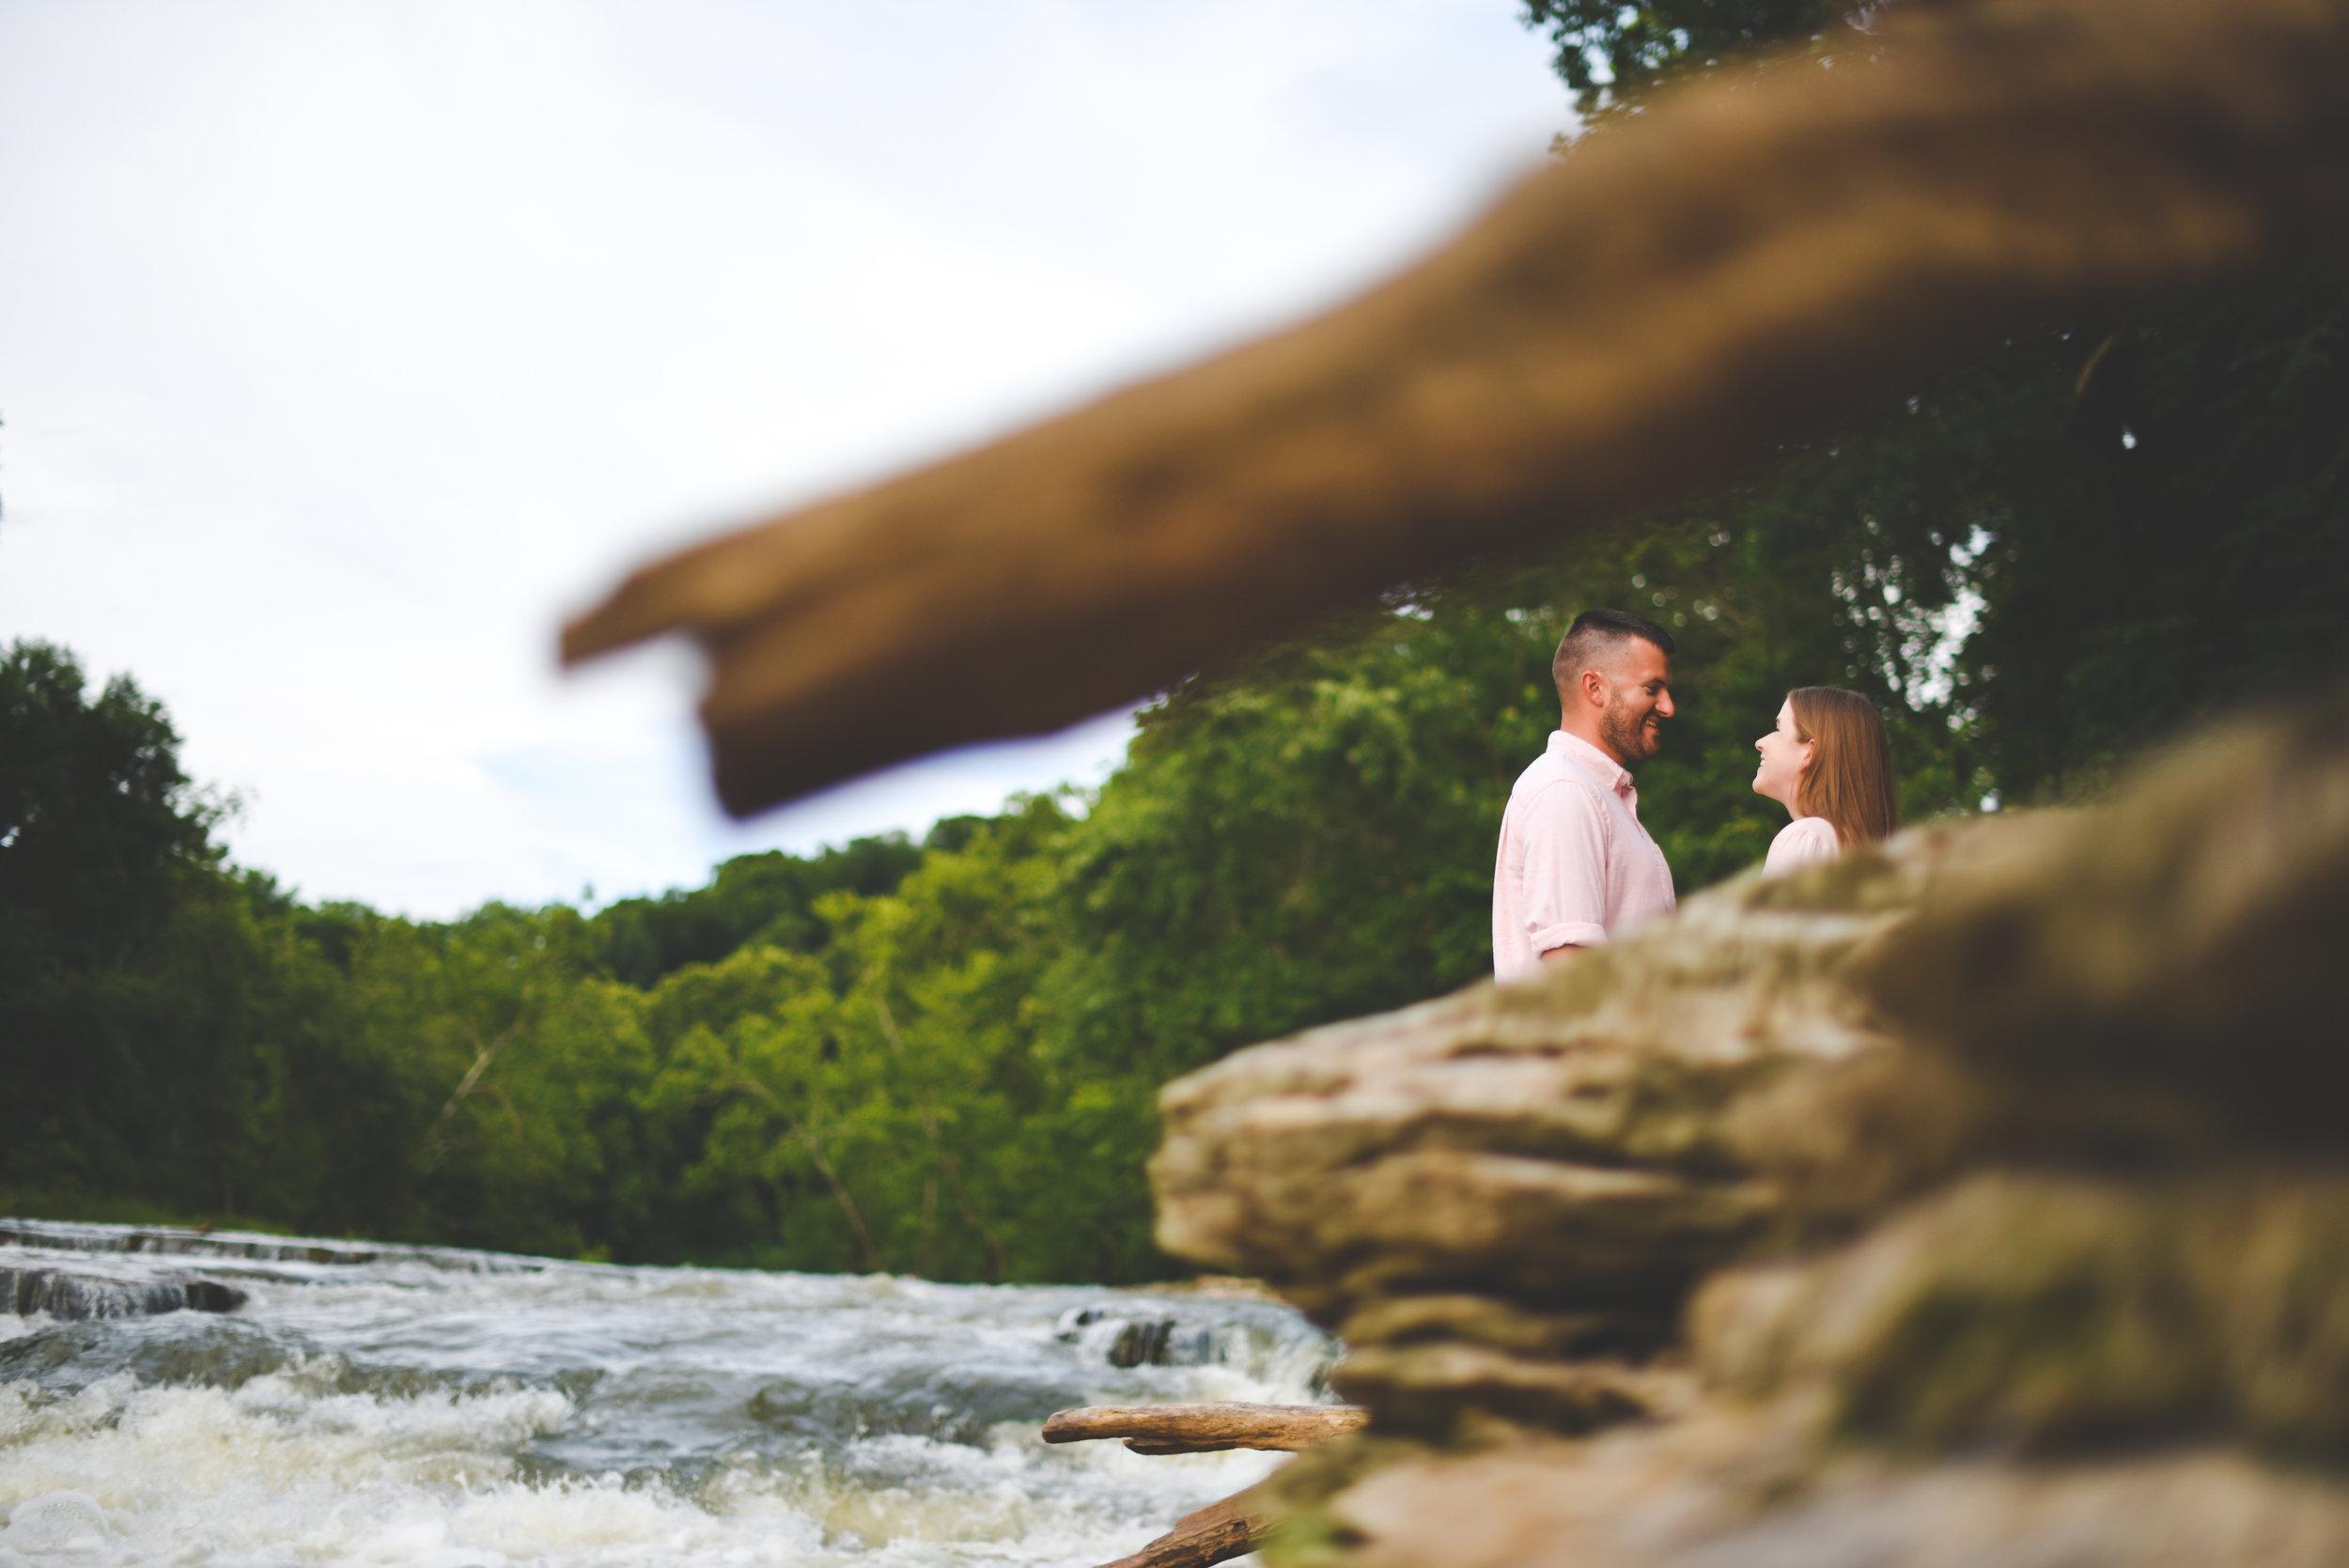 Indianapolis engagement photography - Kendra and Caleb